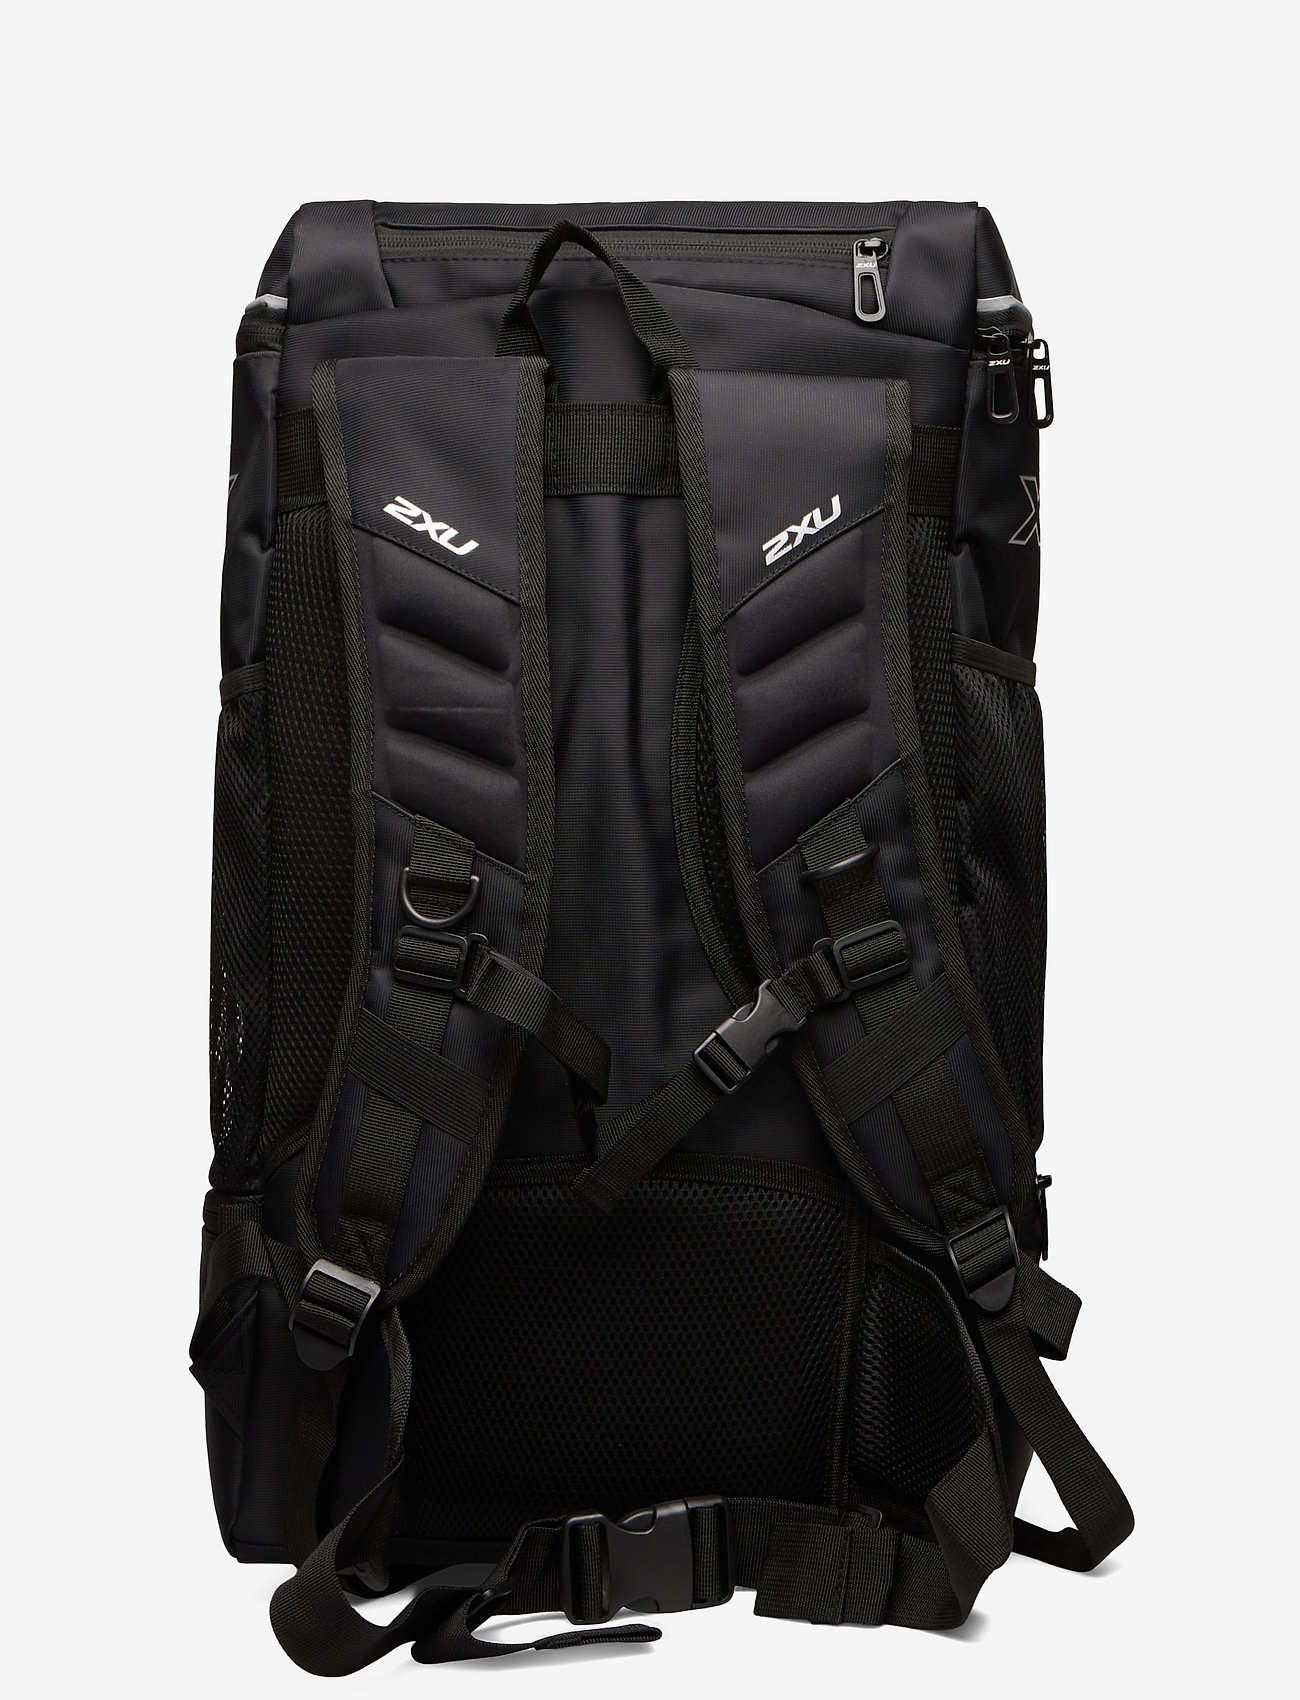 2XU - TRANSITION BAG - sacs a dos - black/black - 1